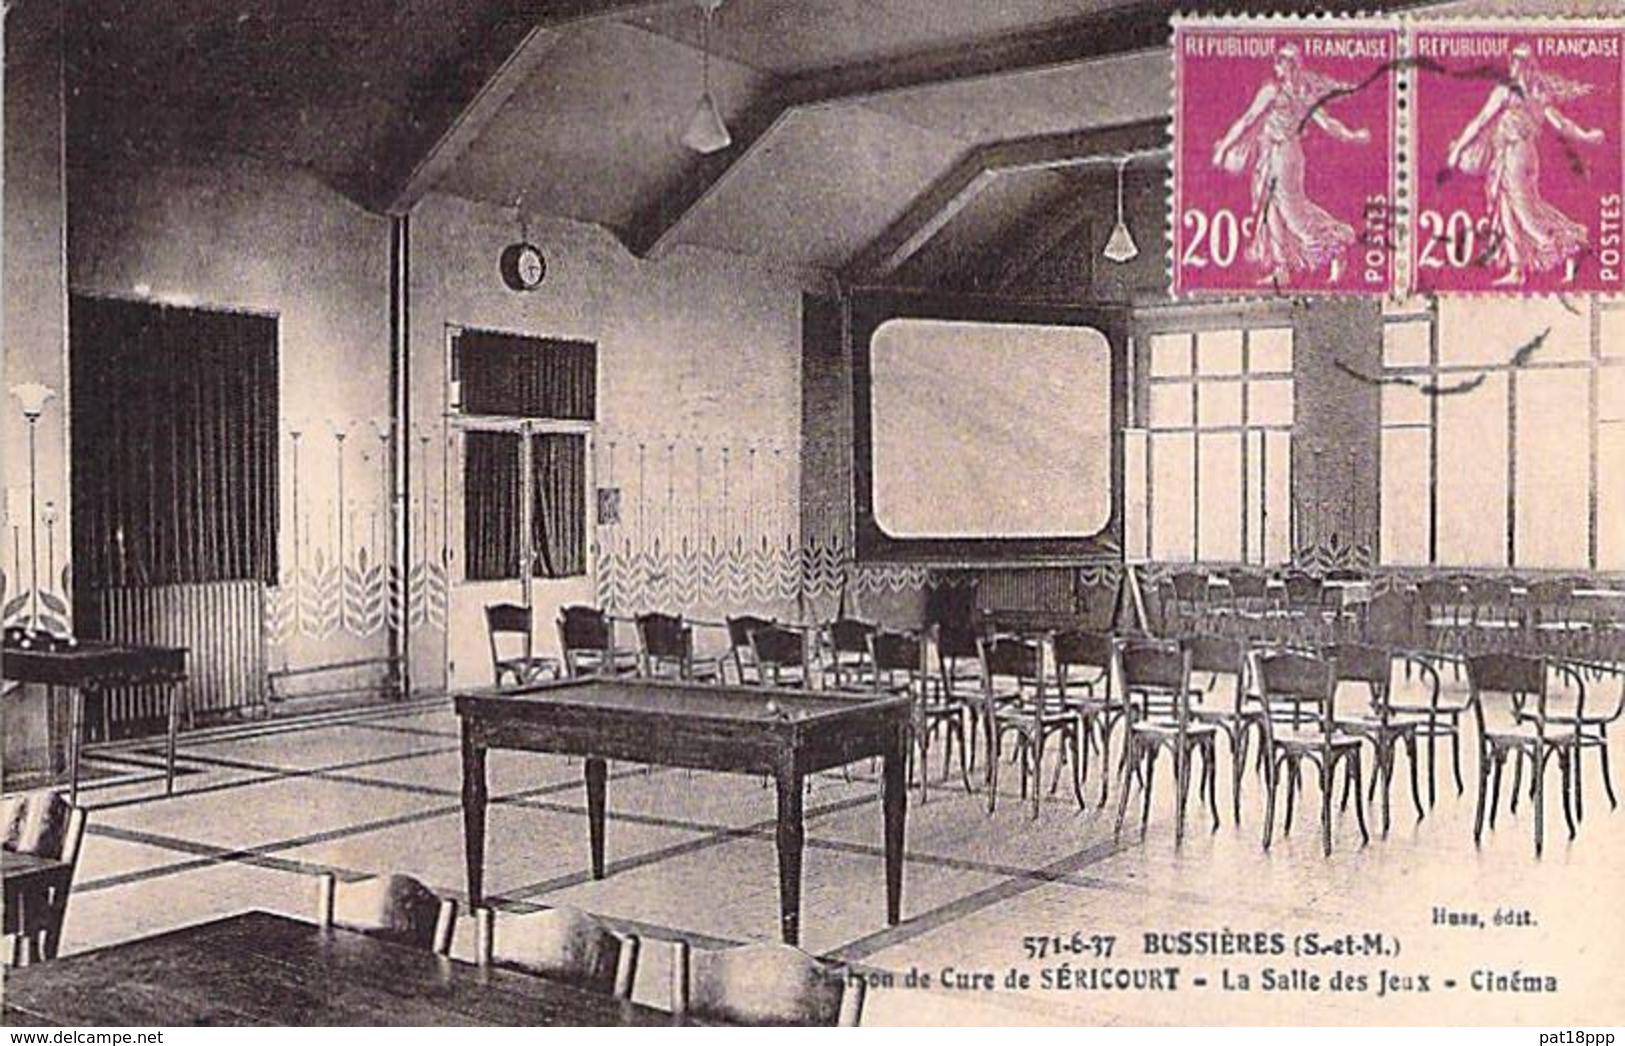 BILLARD Billiards - 77 - BUSSIERES La Salle De JEU CINEMA BILLARD - CPA - Biljart Billar Biliardo - Seine Et Marne - Cartes Postales